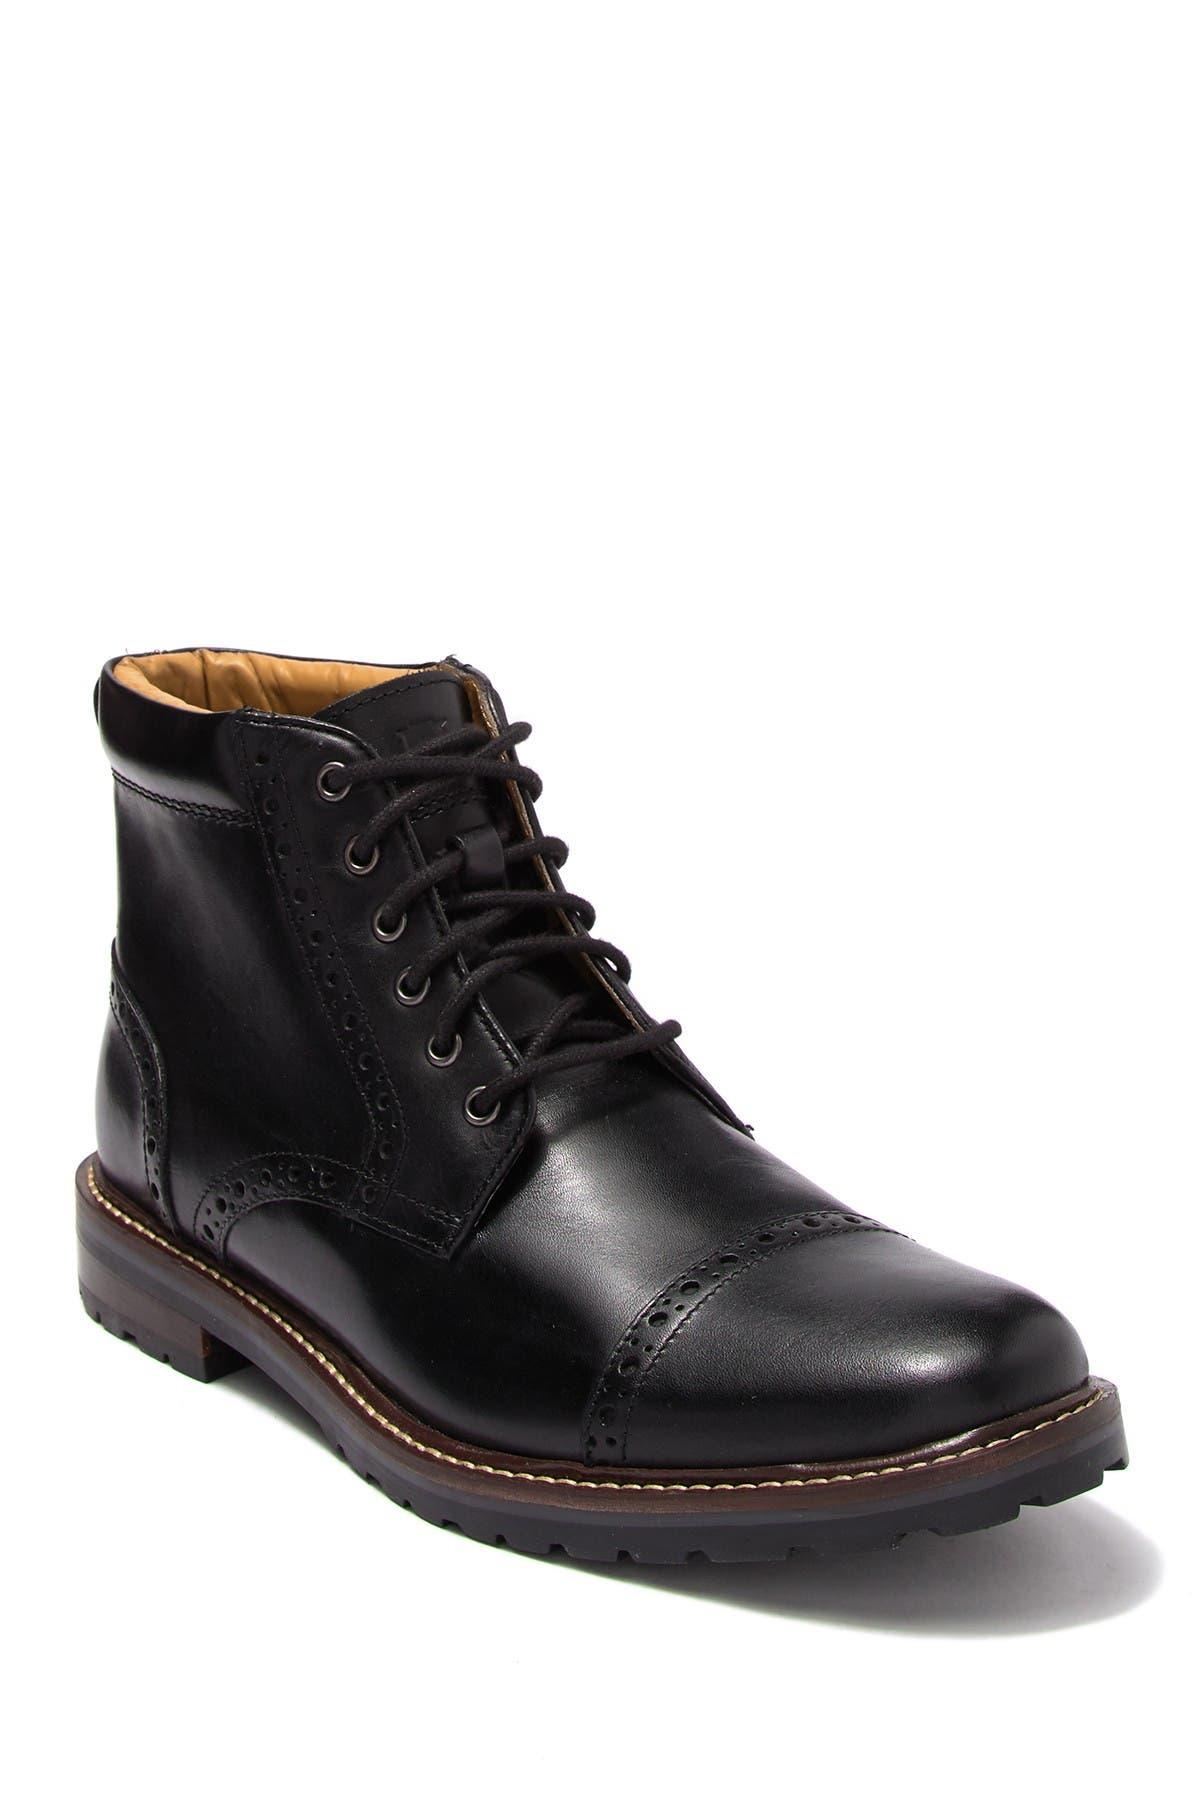 Image of Florsheim Fenway Leather Cap Toe Boot